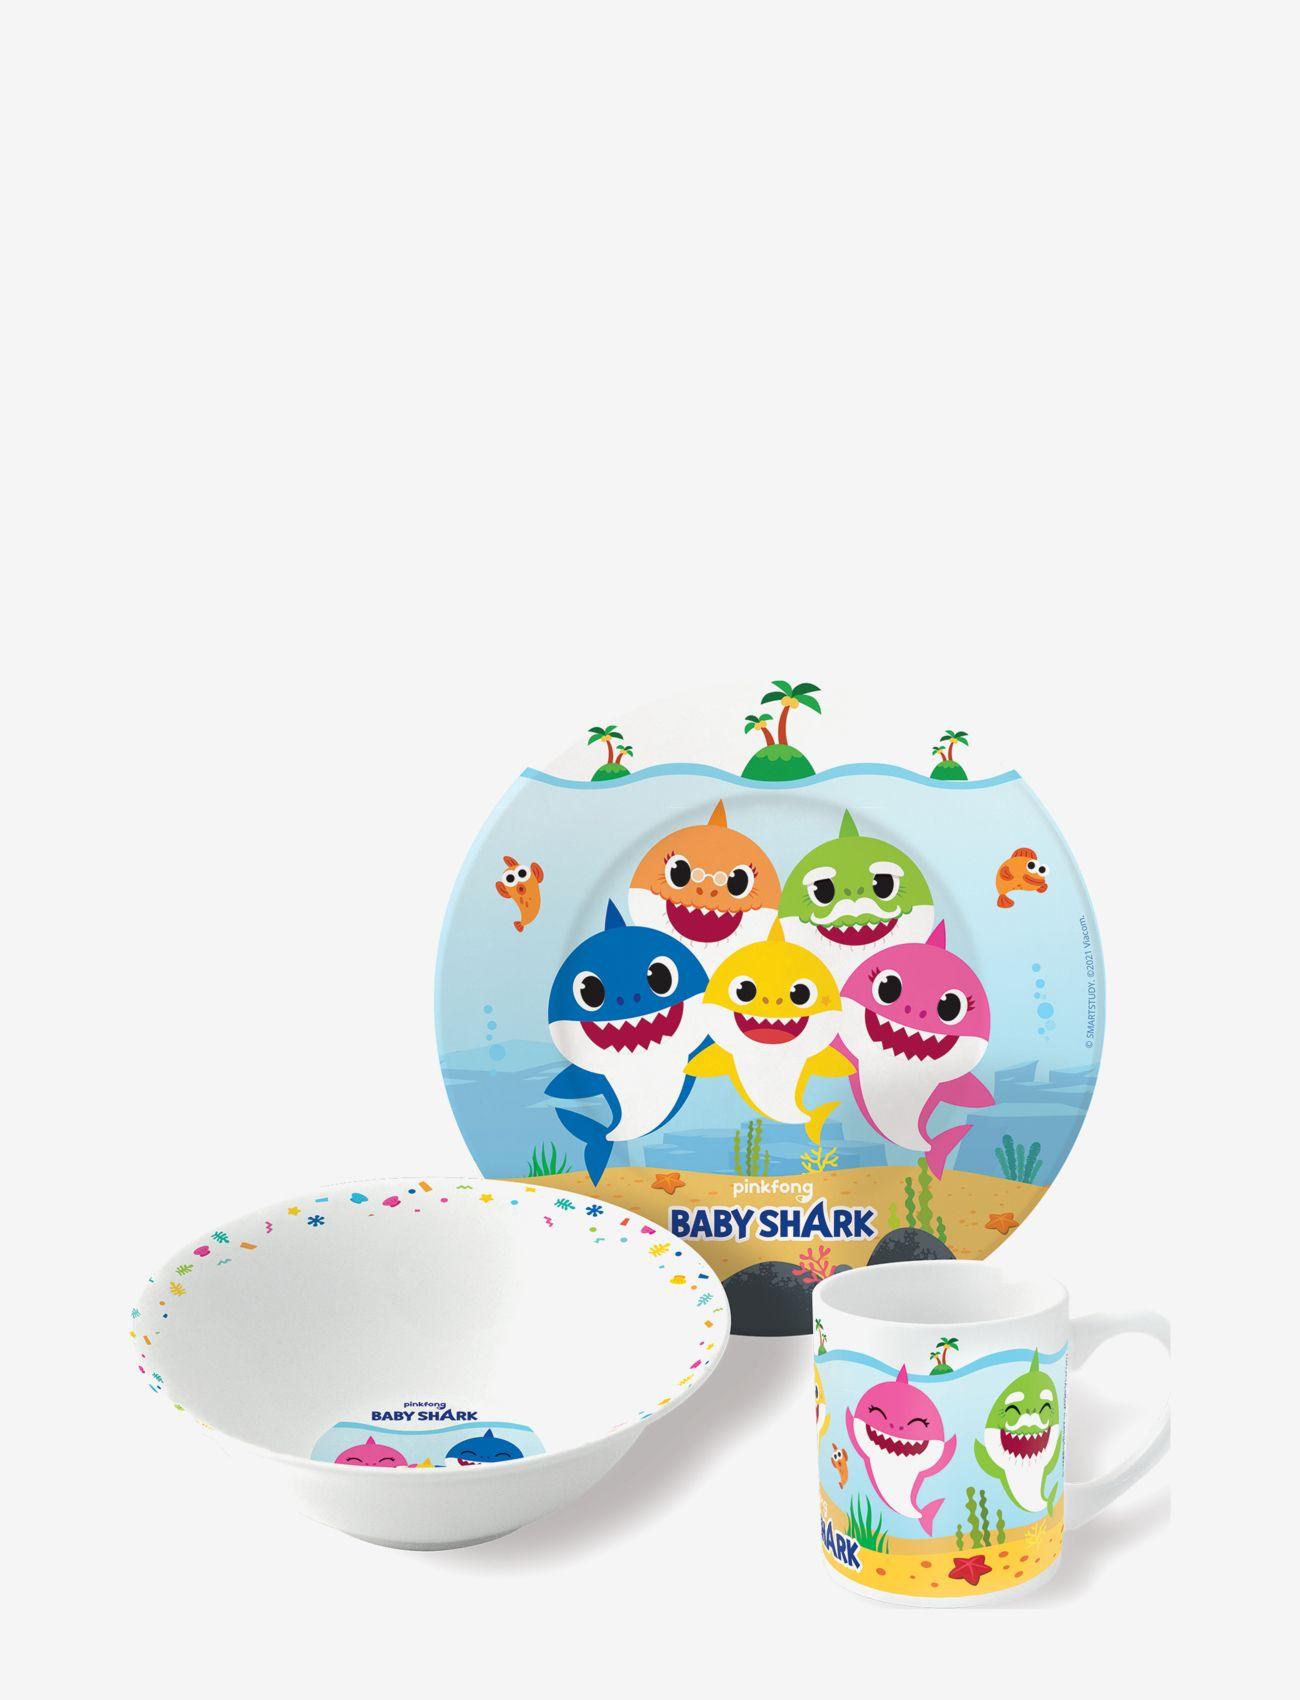 Baby Shark 3 pcs offset snack set, ceramic